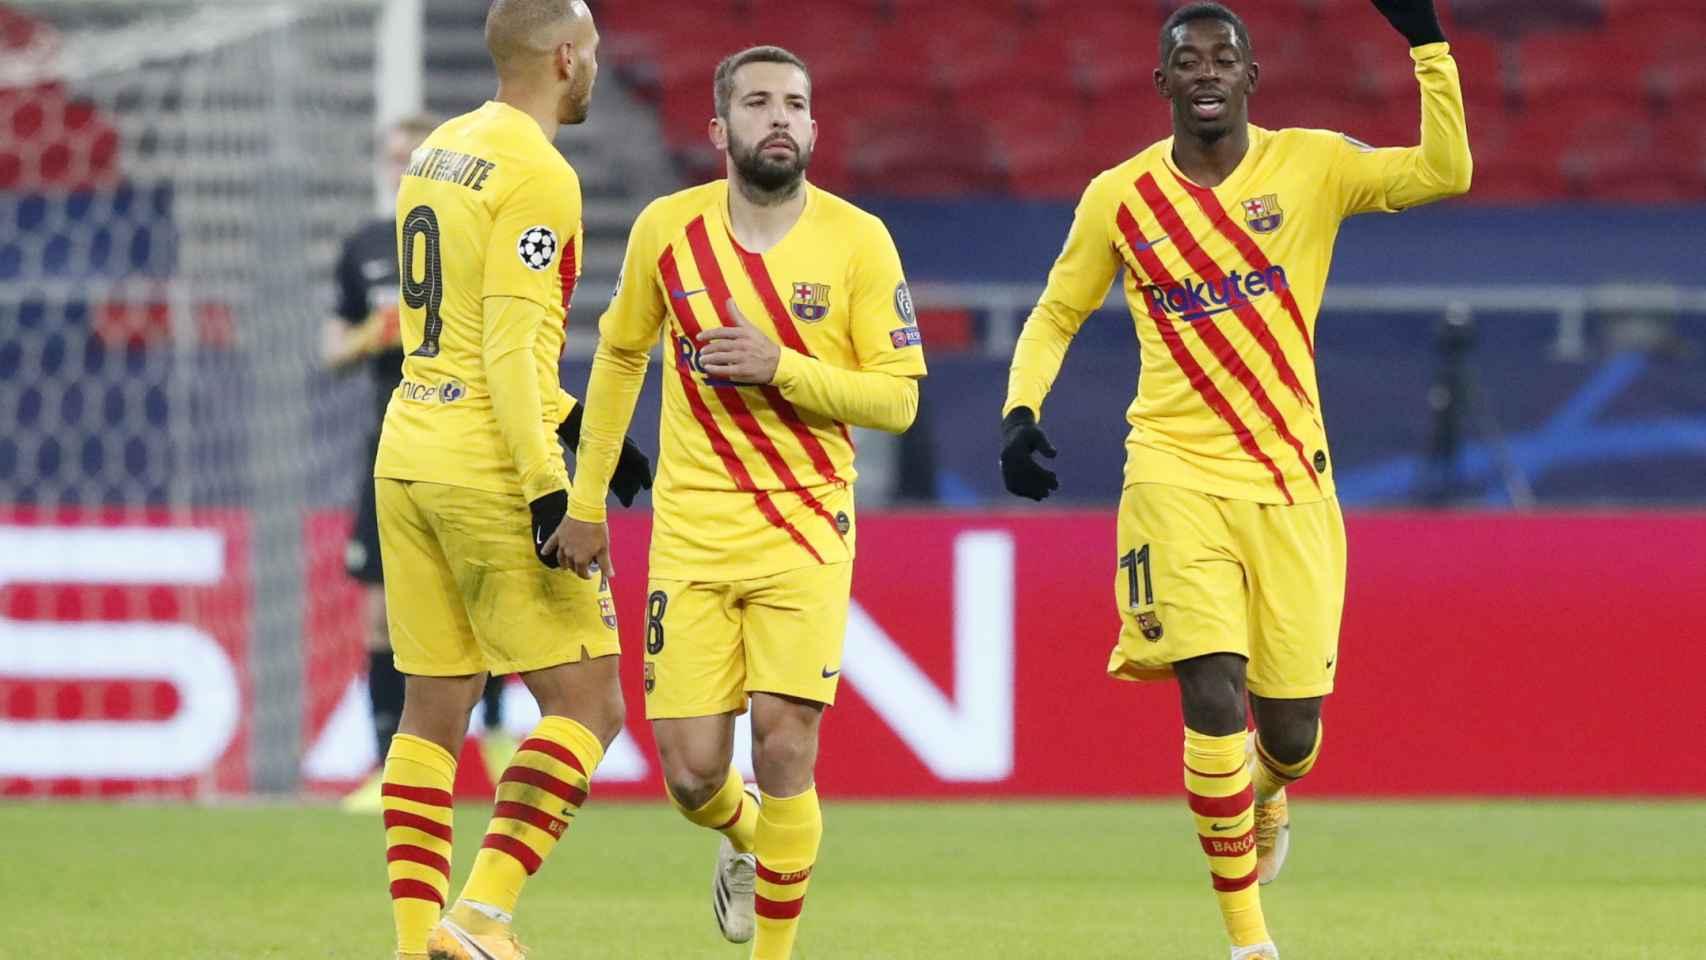 Ousmane Dembélé celebra su gol de penalti en la Champions League